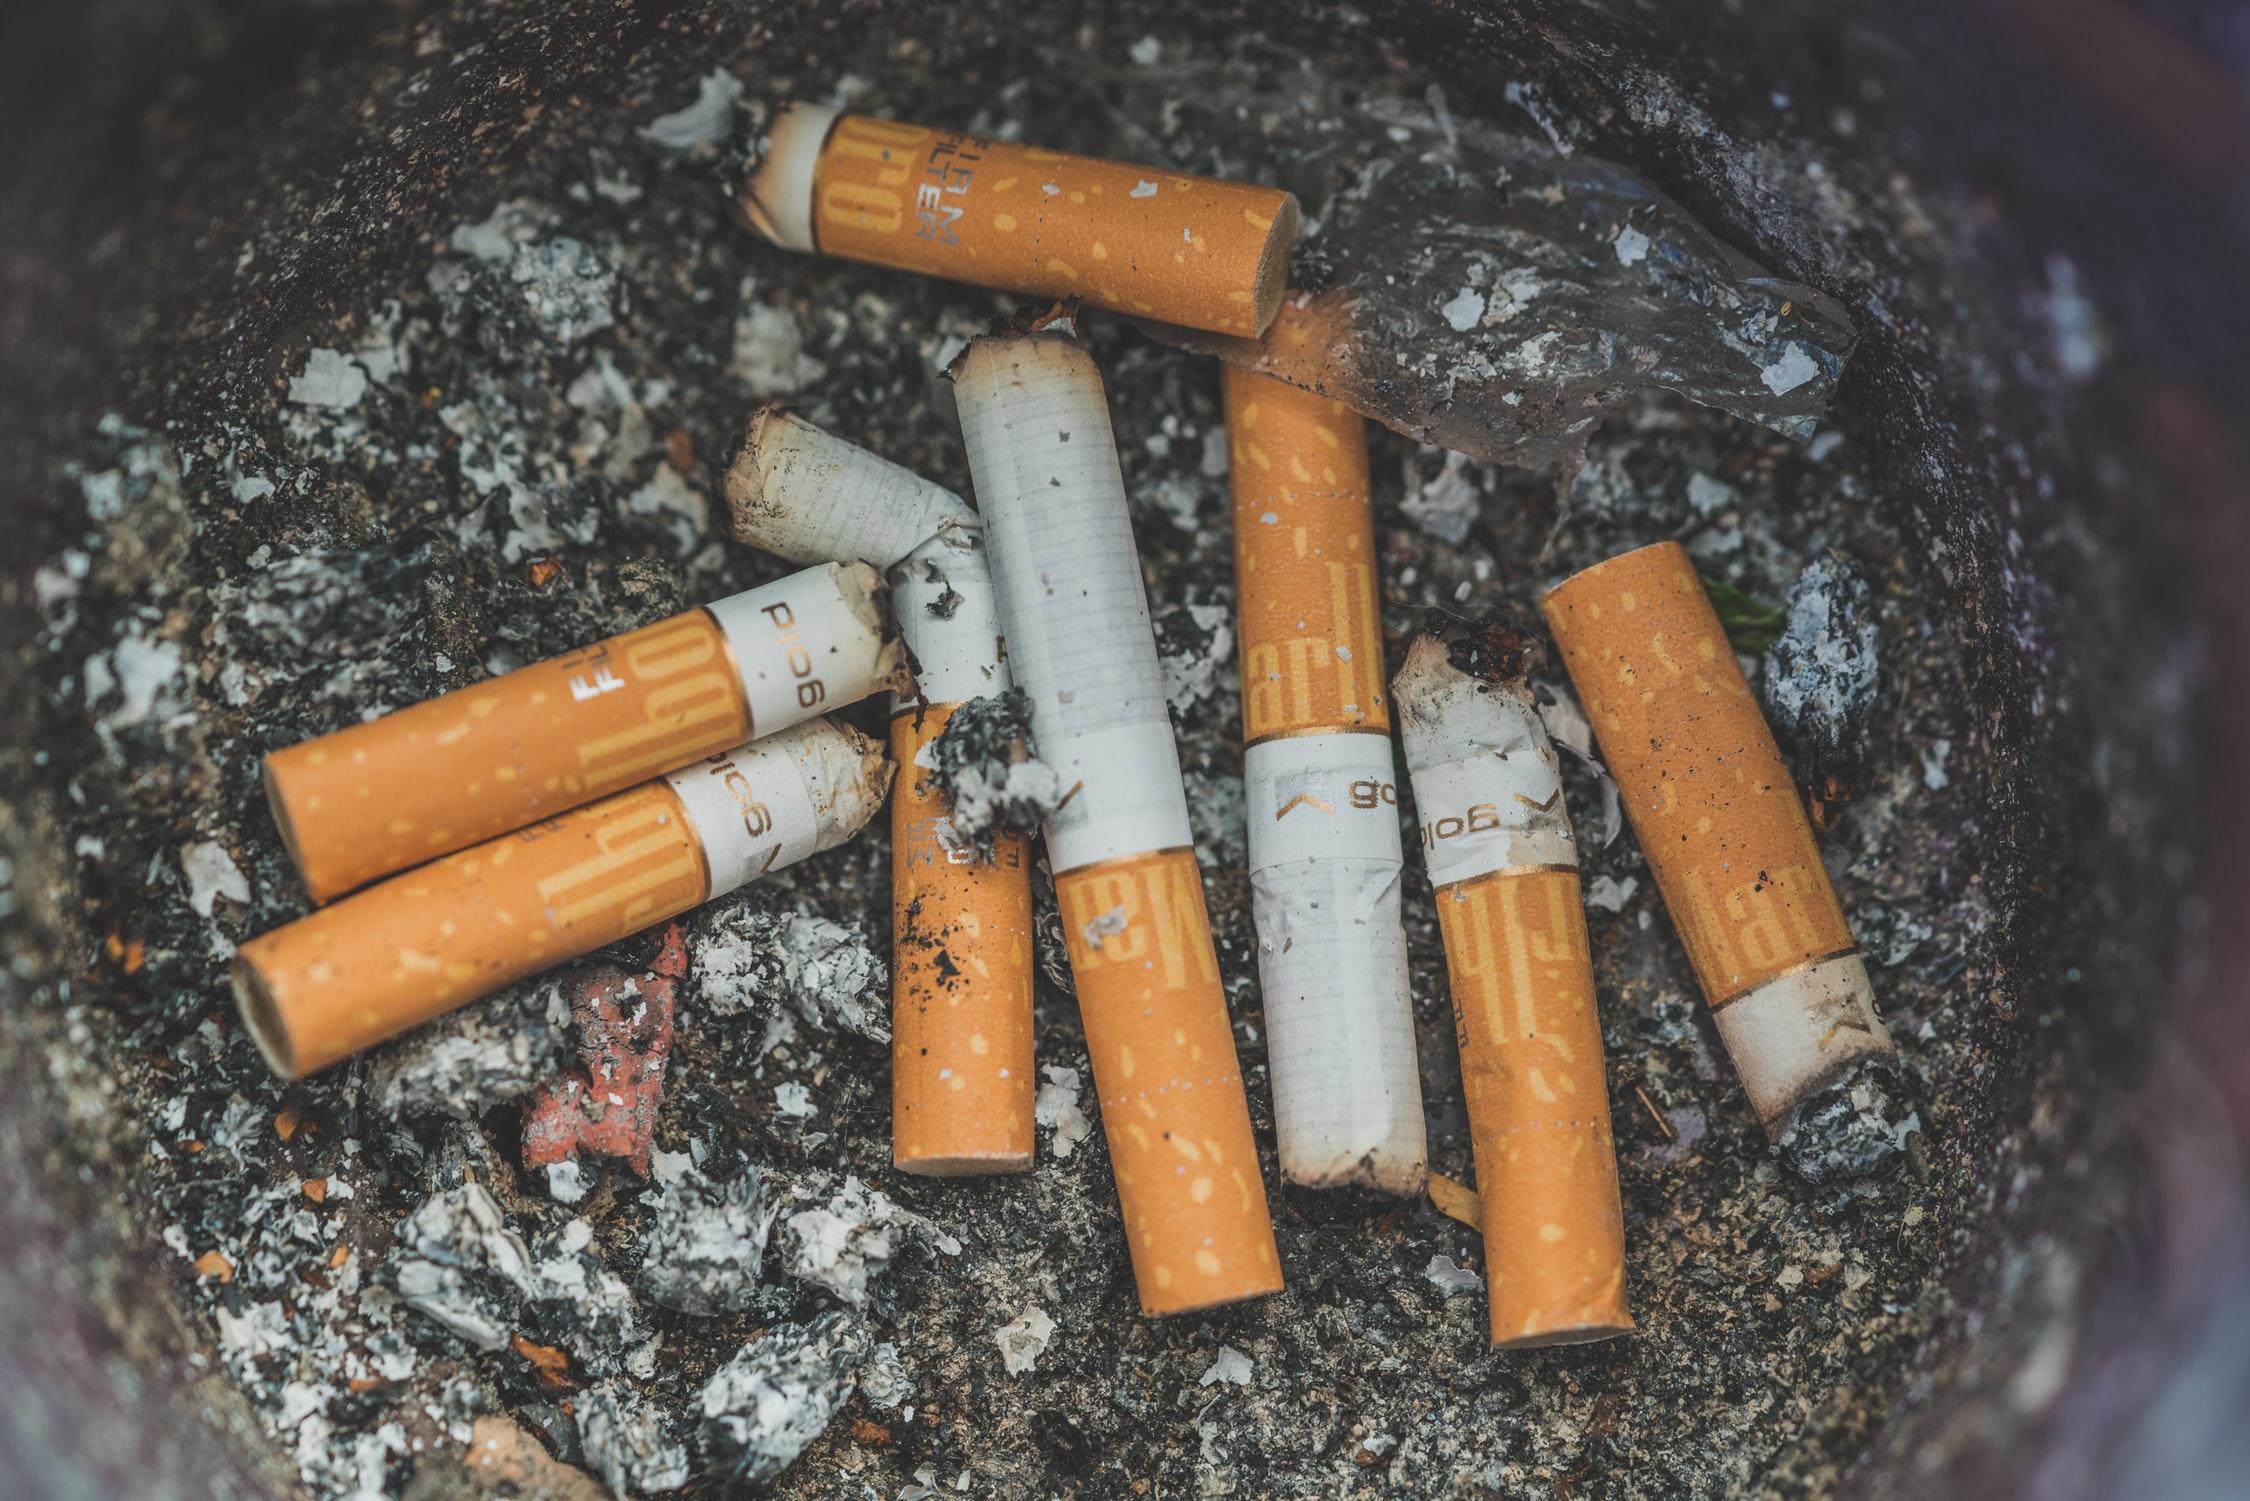 Cigarette butts smoking cessation image.